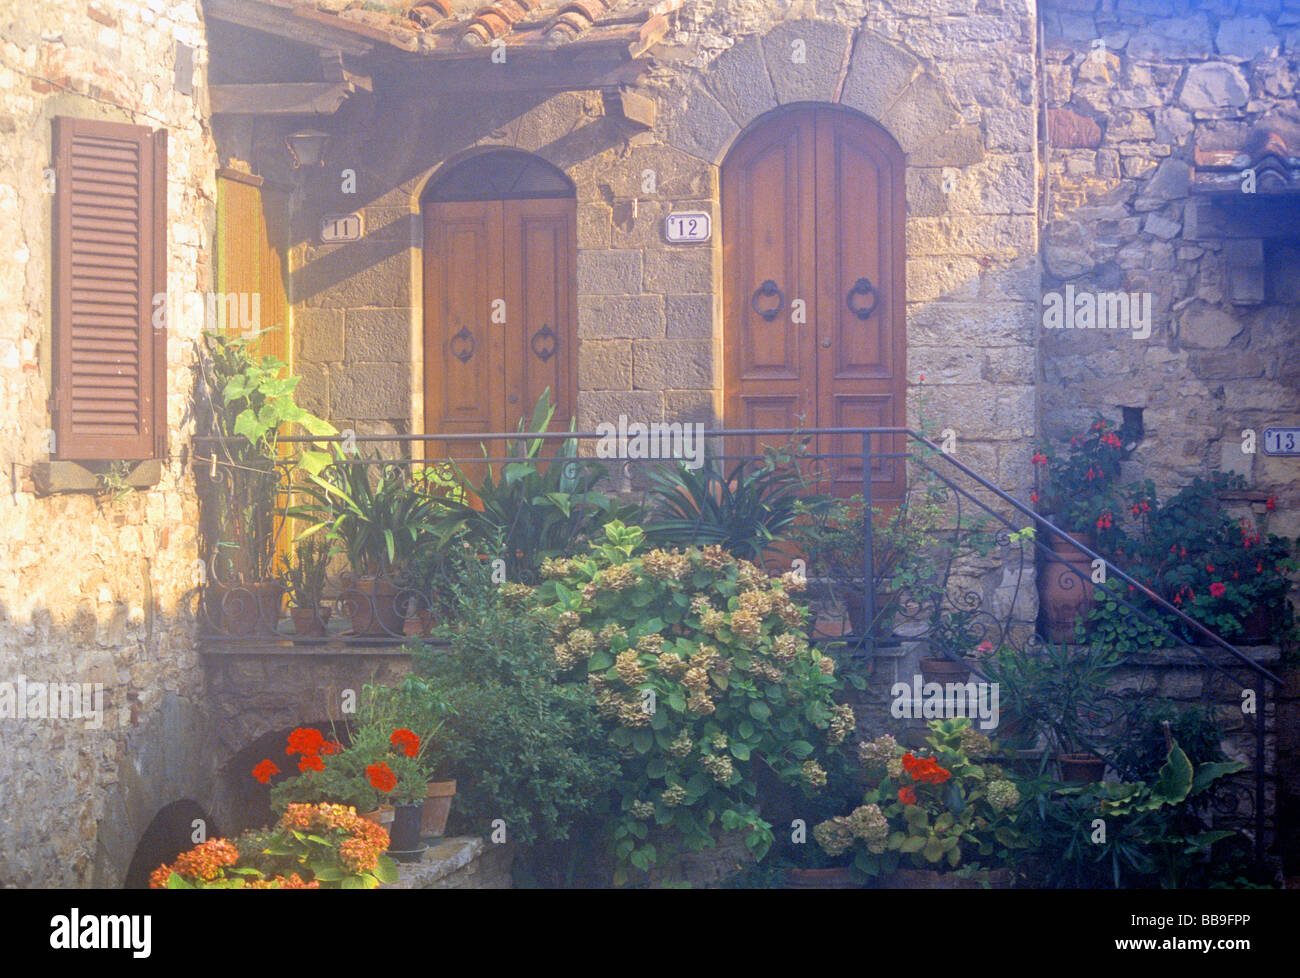 blumengeschmückten Innenhof des Wohnhauses Region der Toskana Italien Stockbild